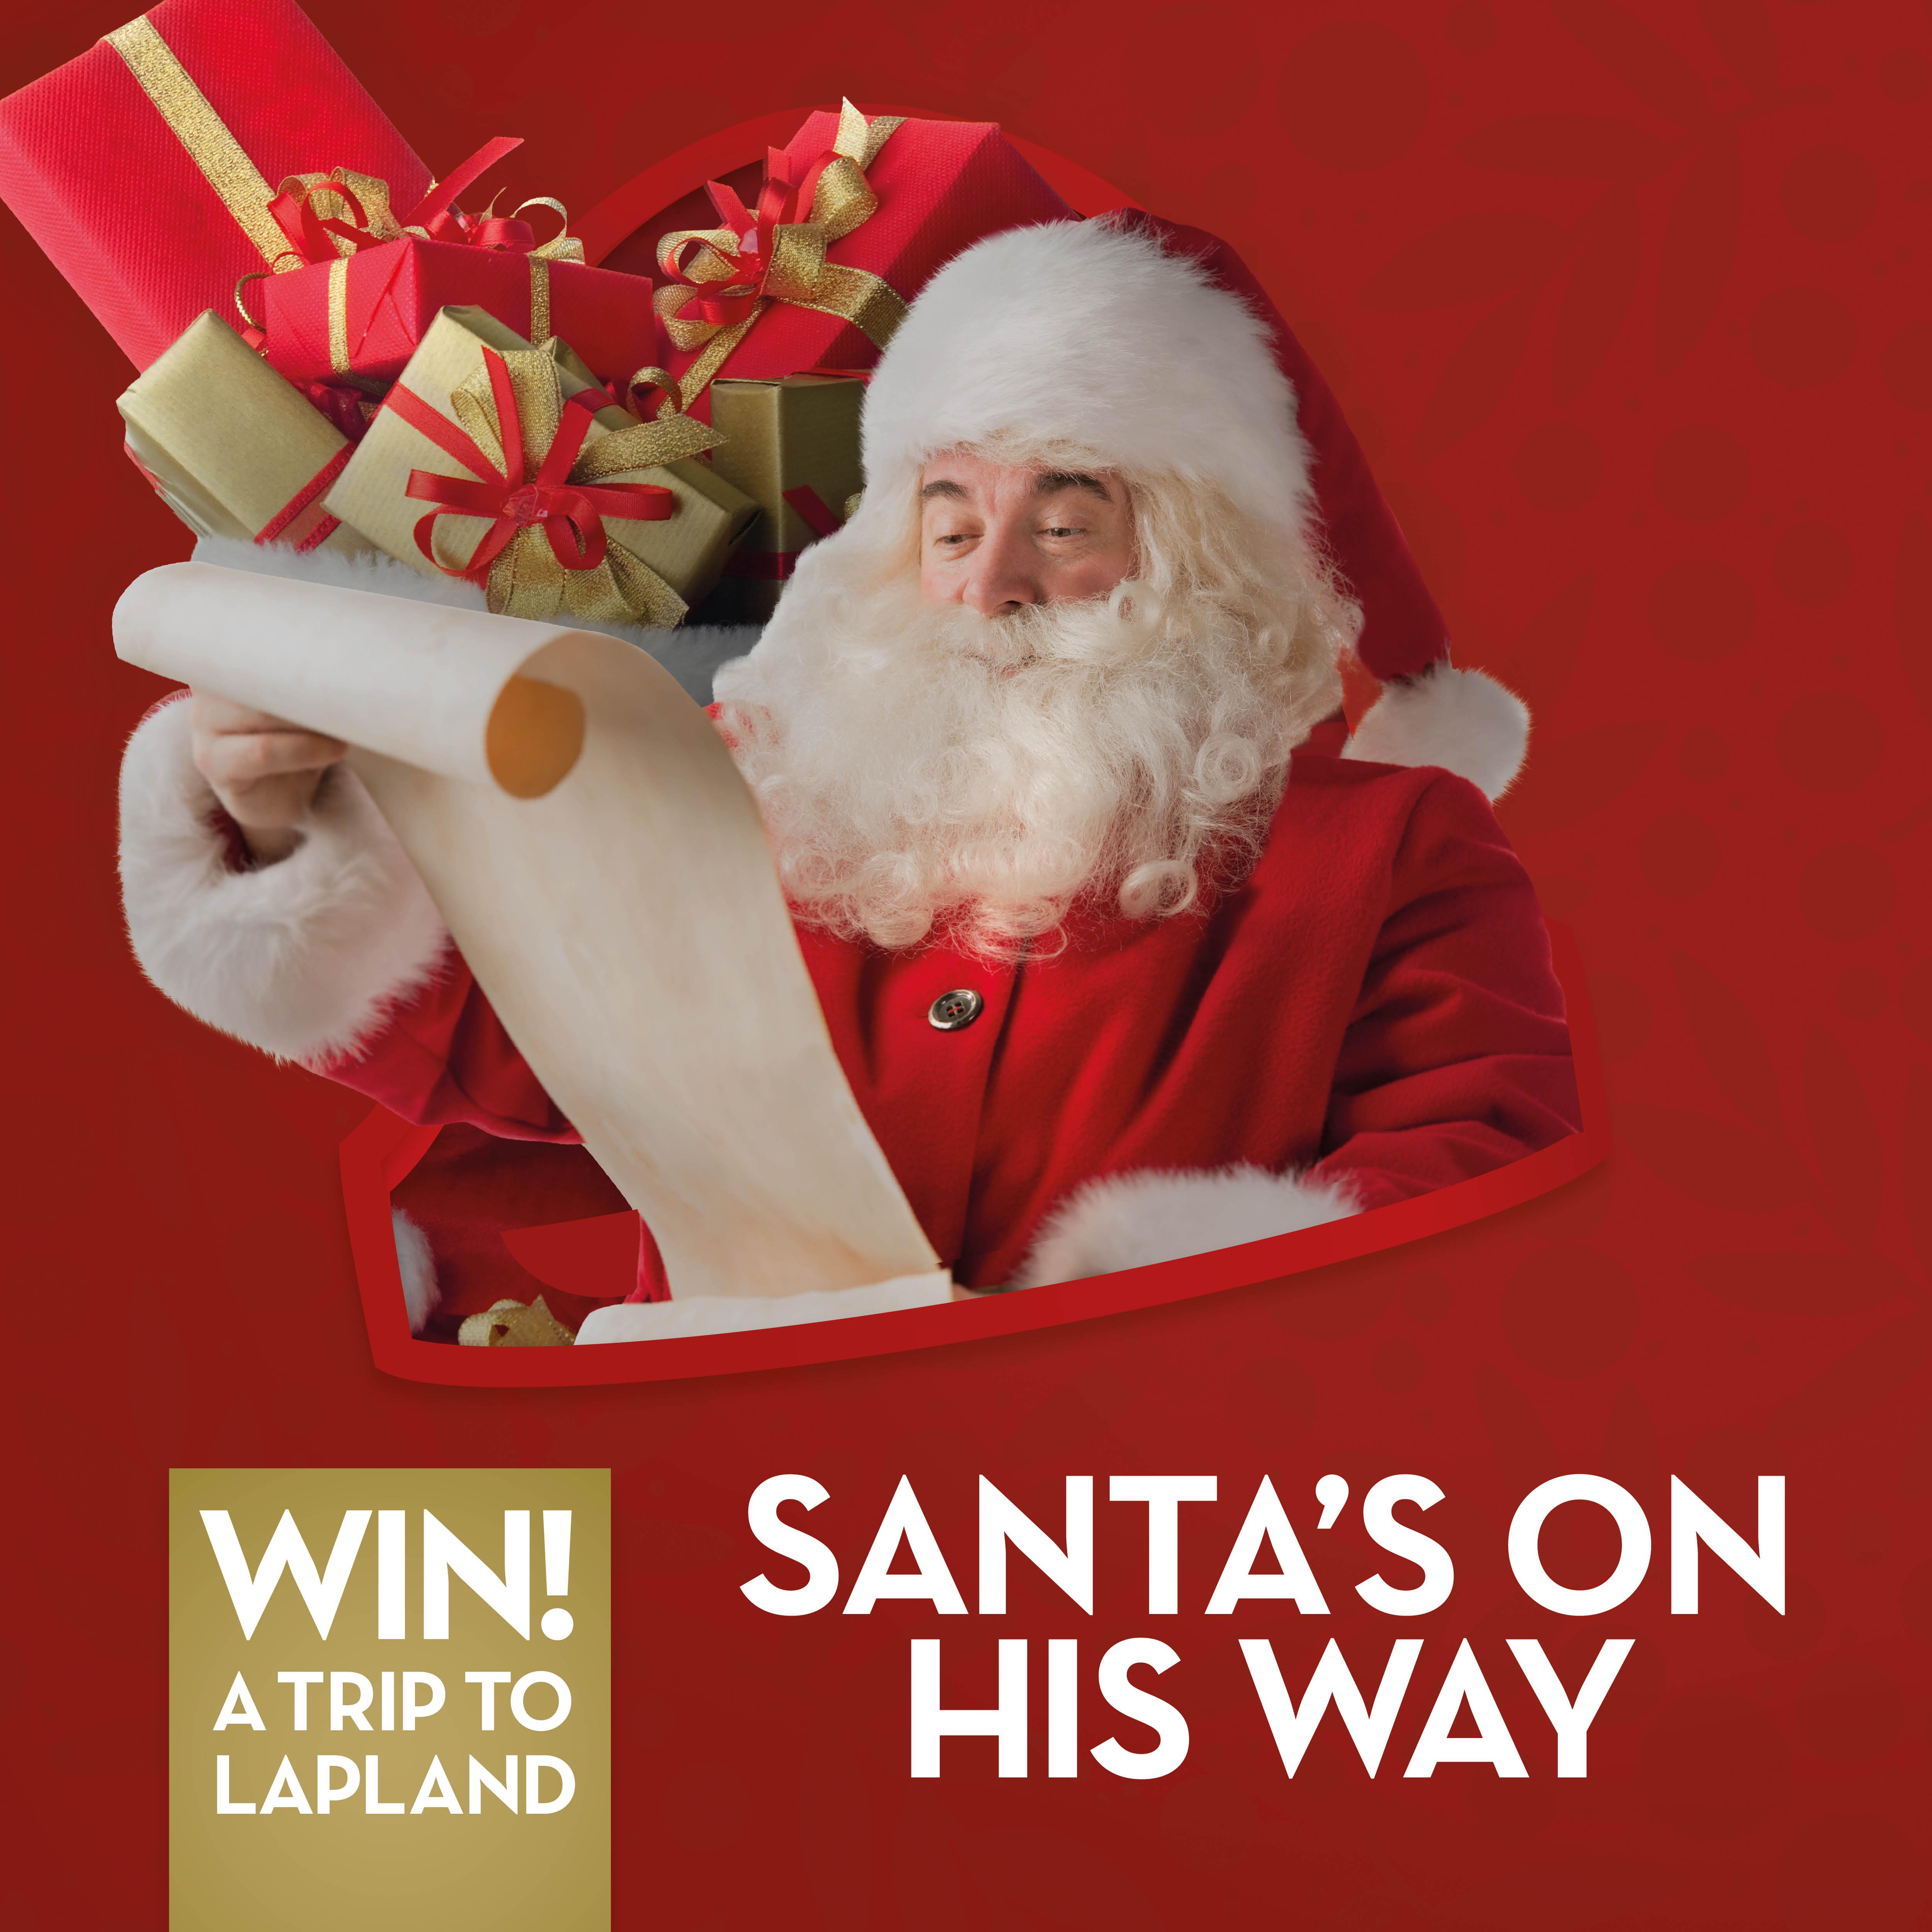 Santa's on his way to SkyCourt